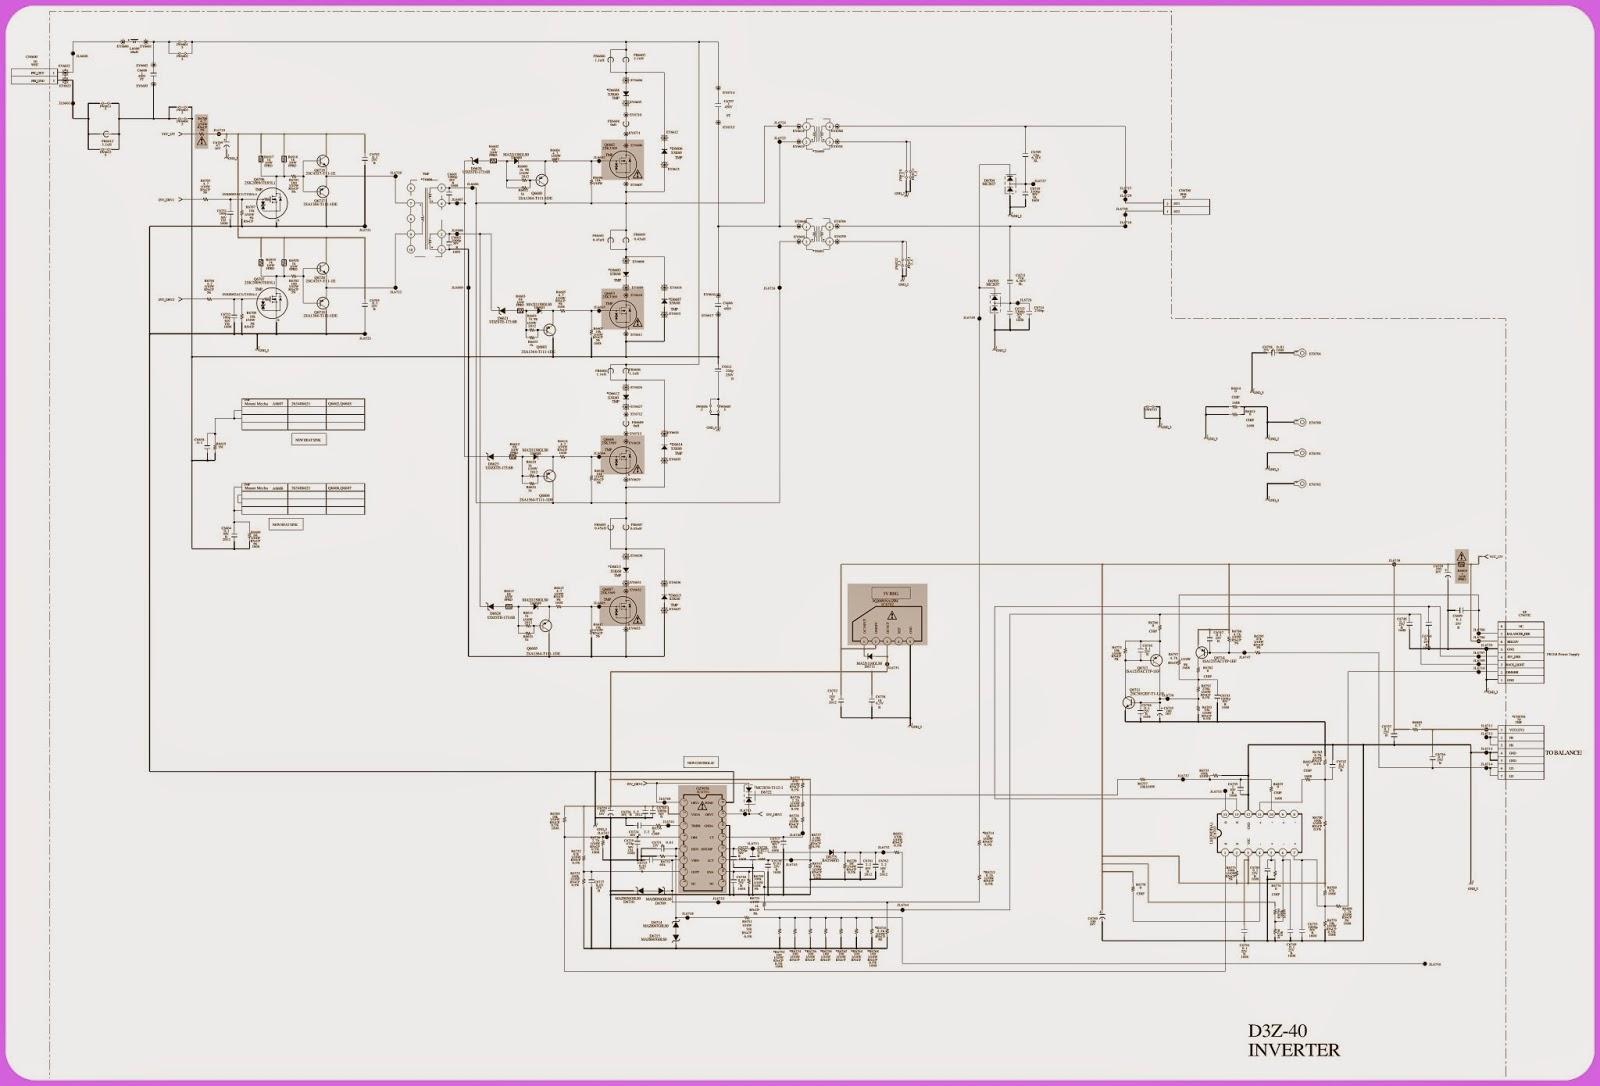 ELECTRONIC EQUIPMENT REPAIR CENTRE : SONY KDL-40Z4100